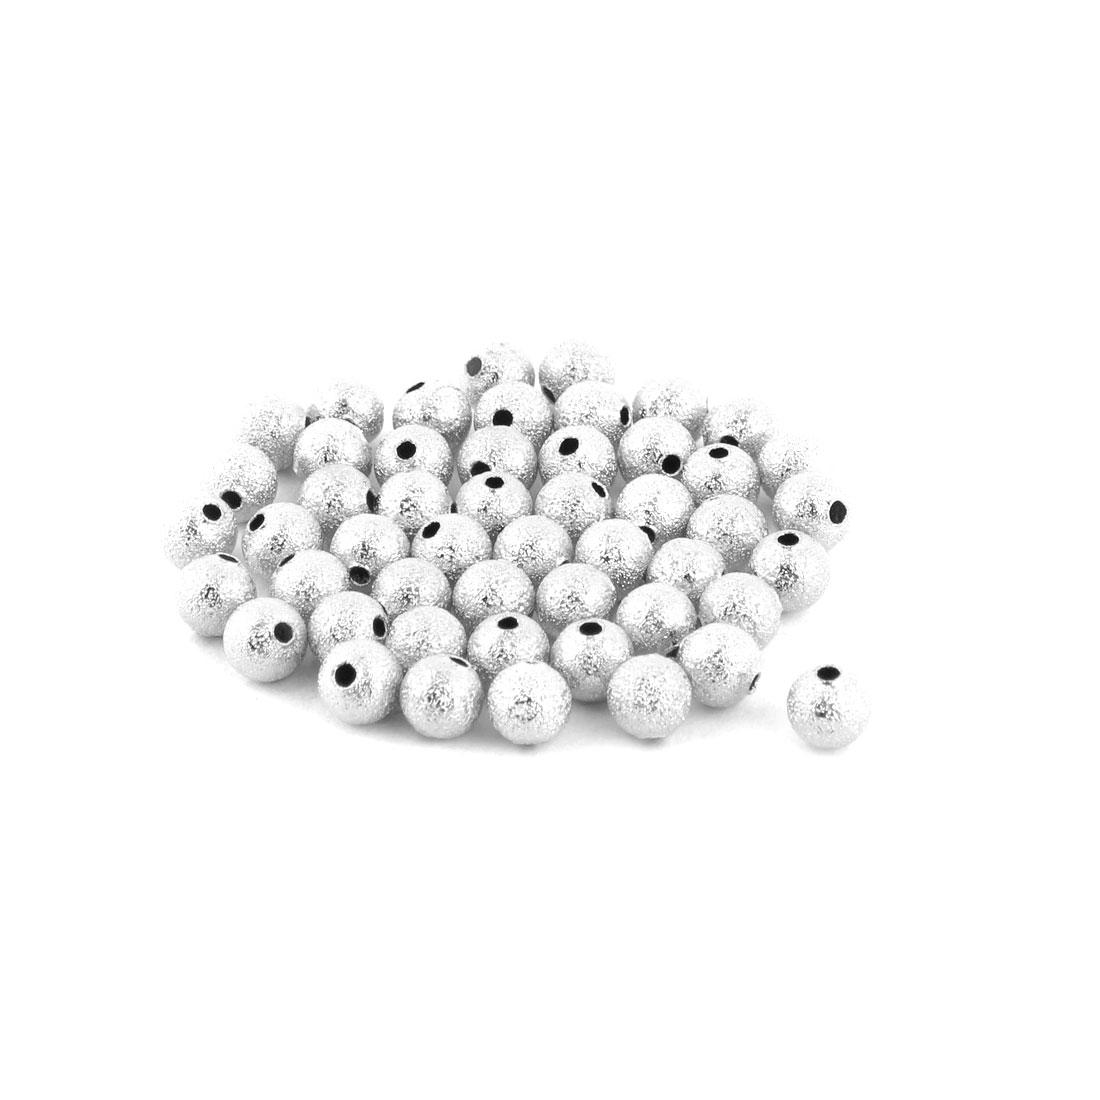 Plastic DIY Necklace Bracelet Making Beads Silver Tone 6mm Diameter 50pcs